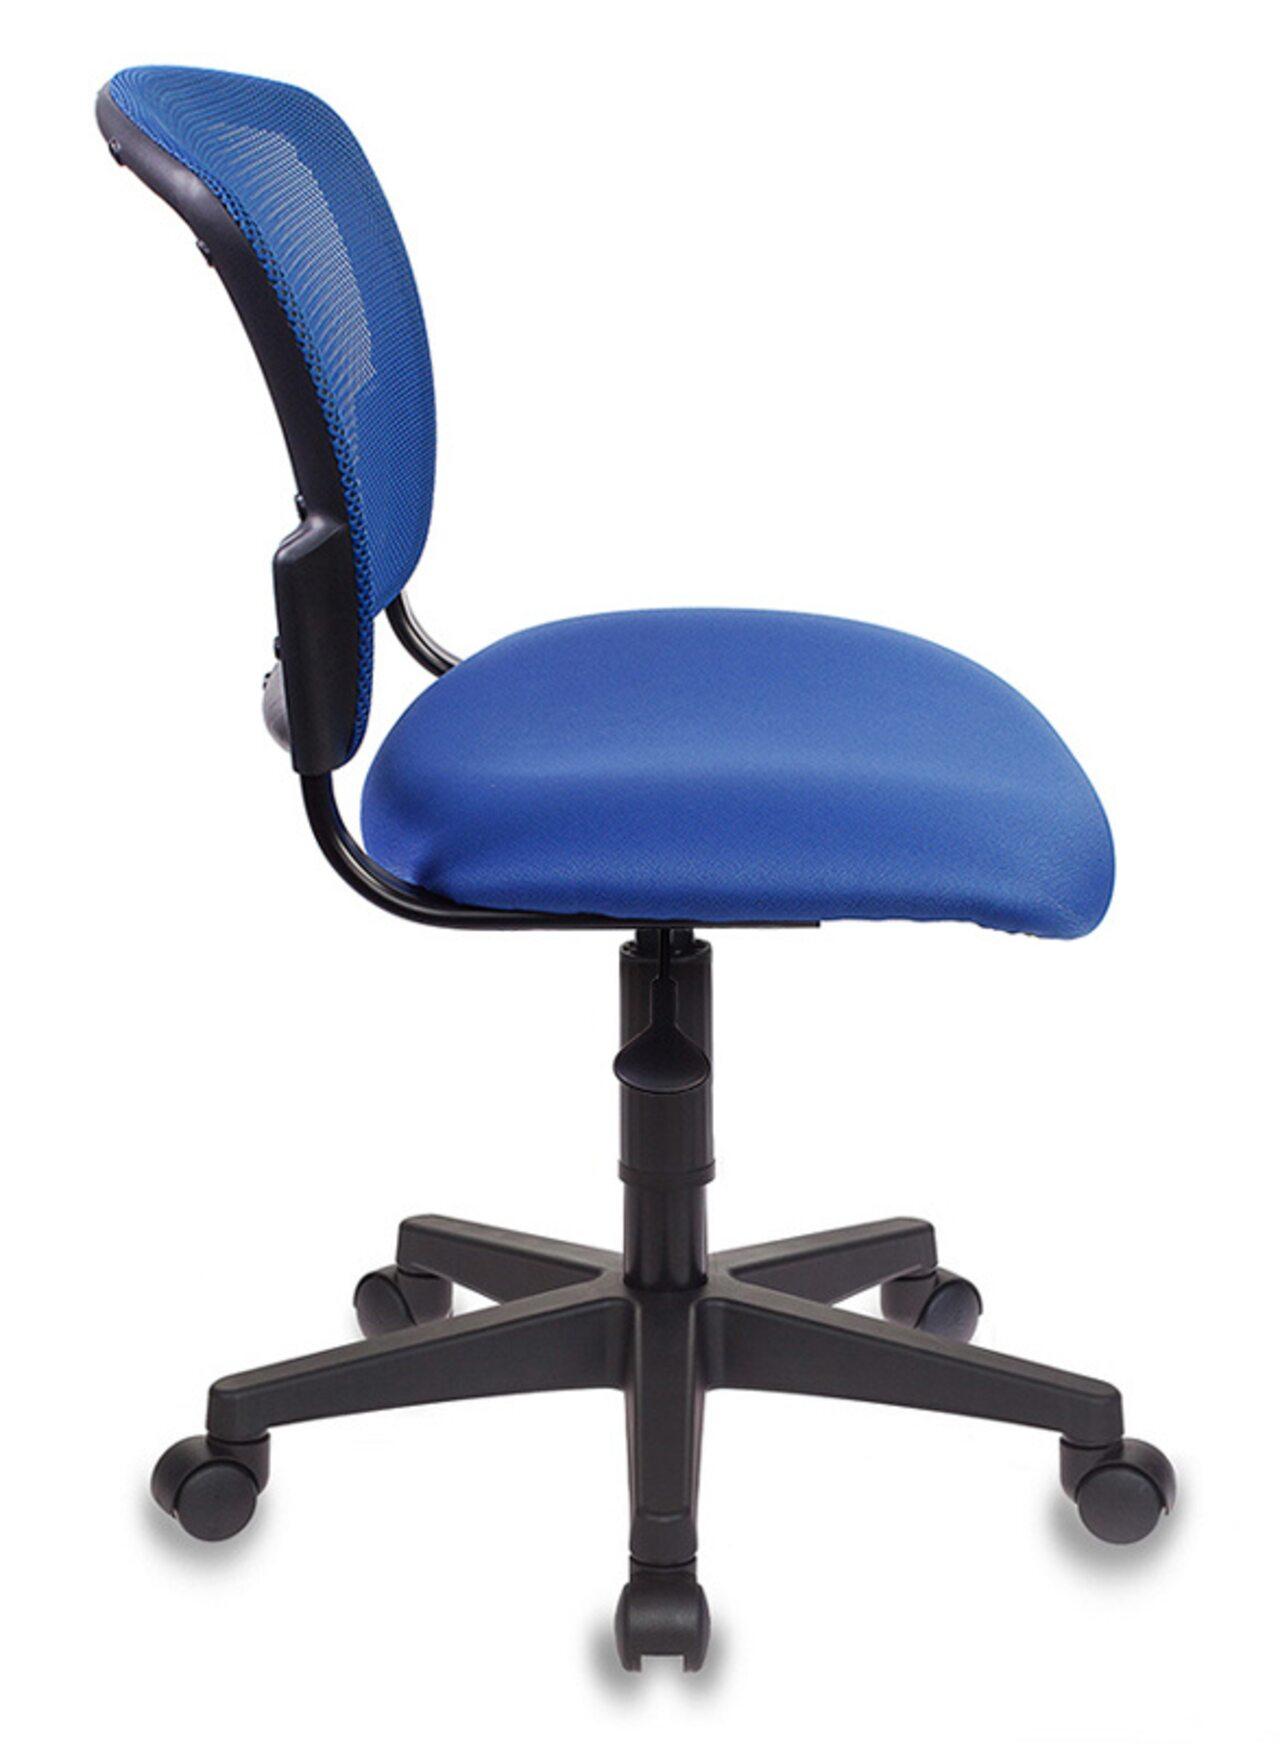 Кресло для персонала CH-296/BL/15-10 - фото 2